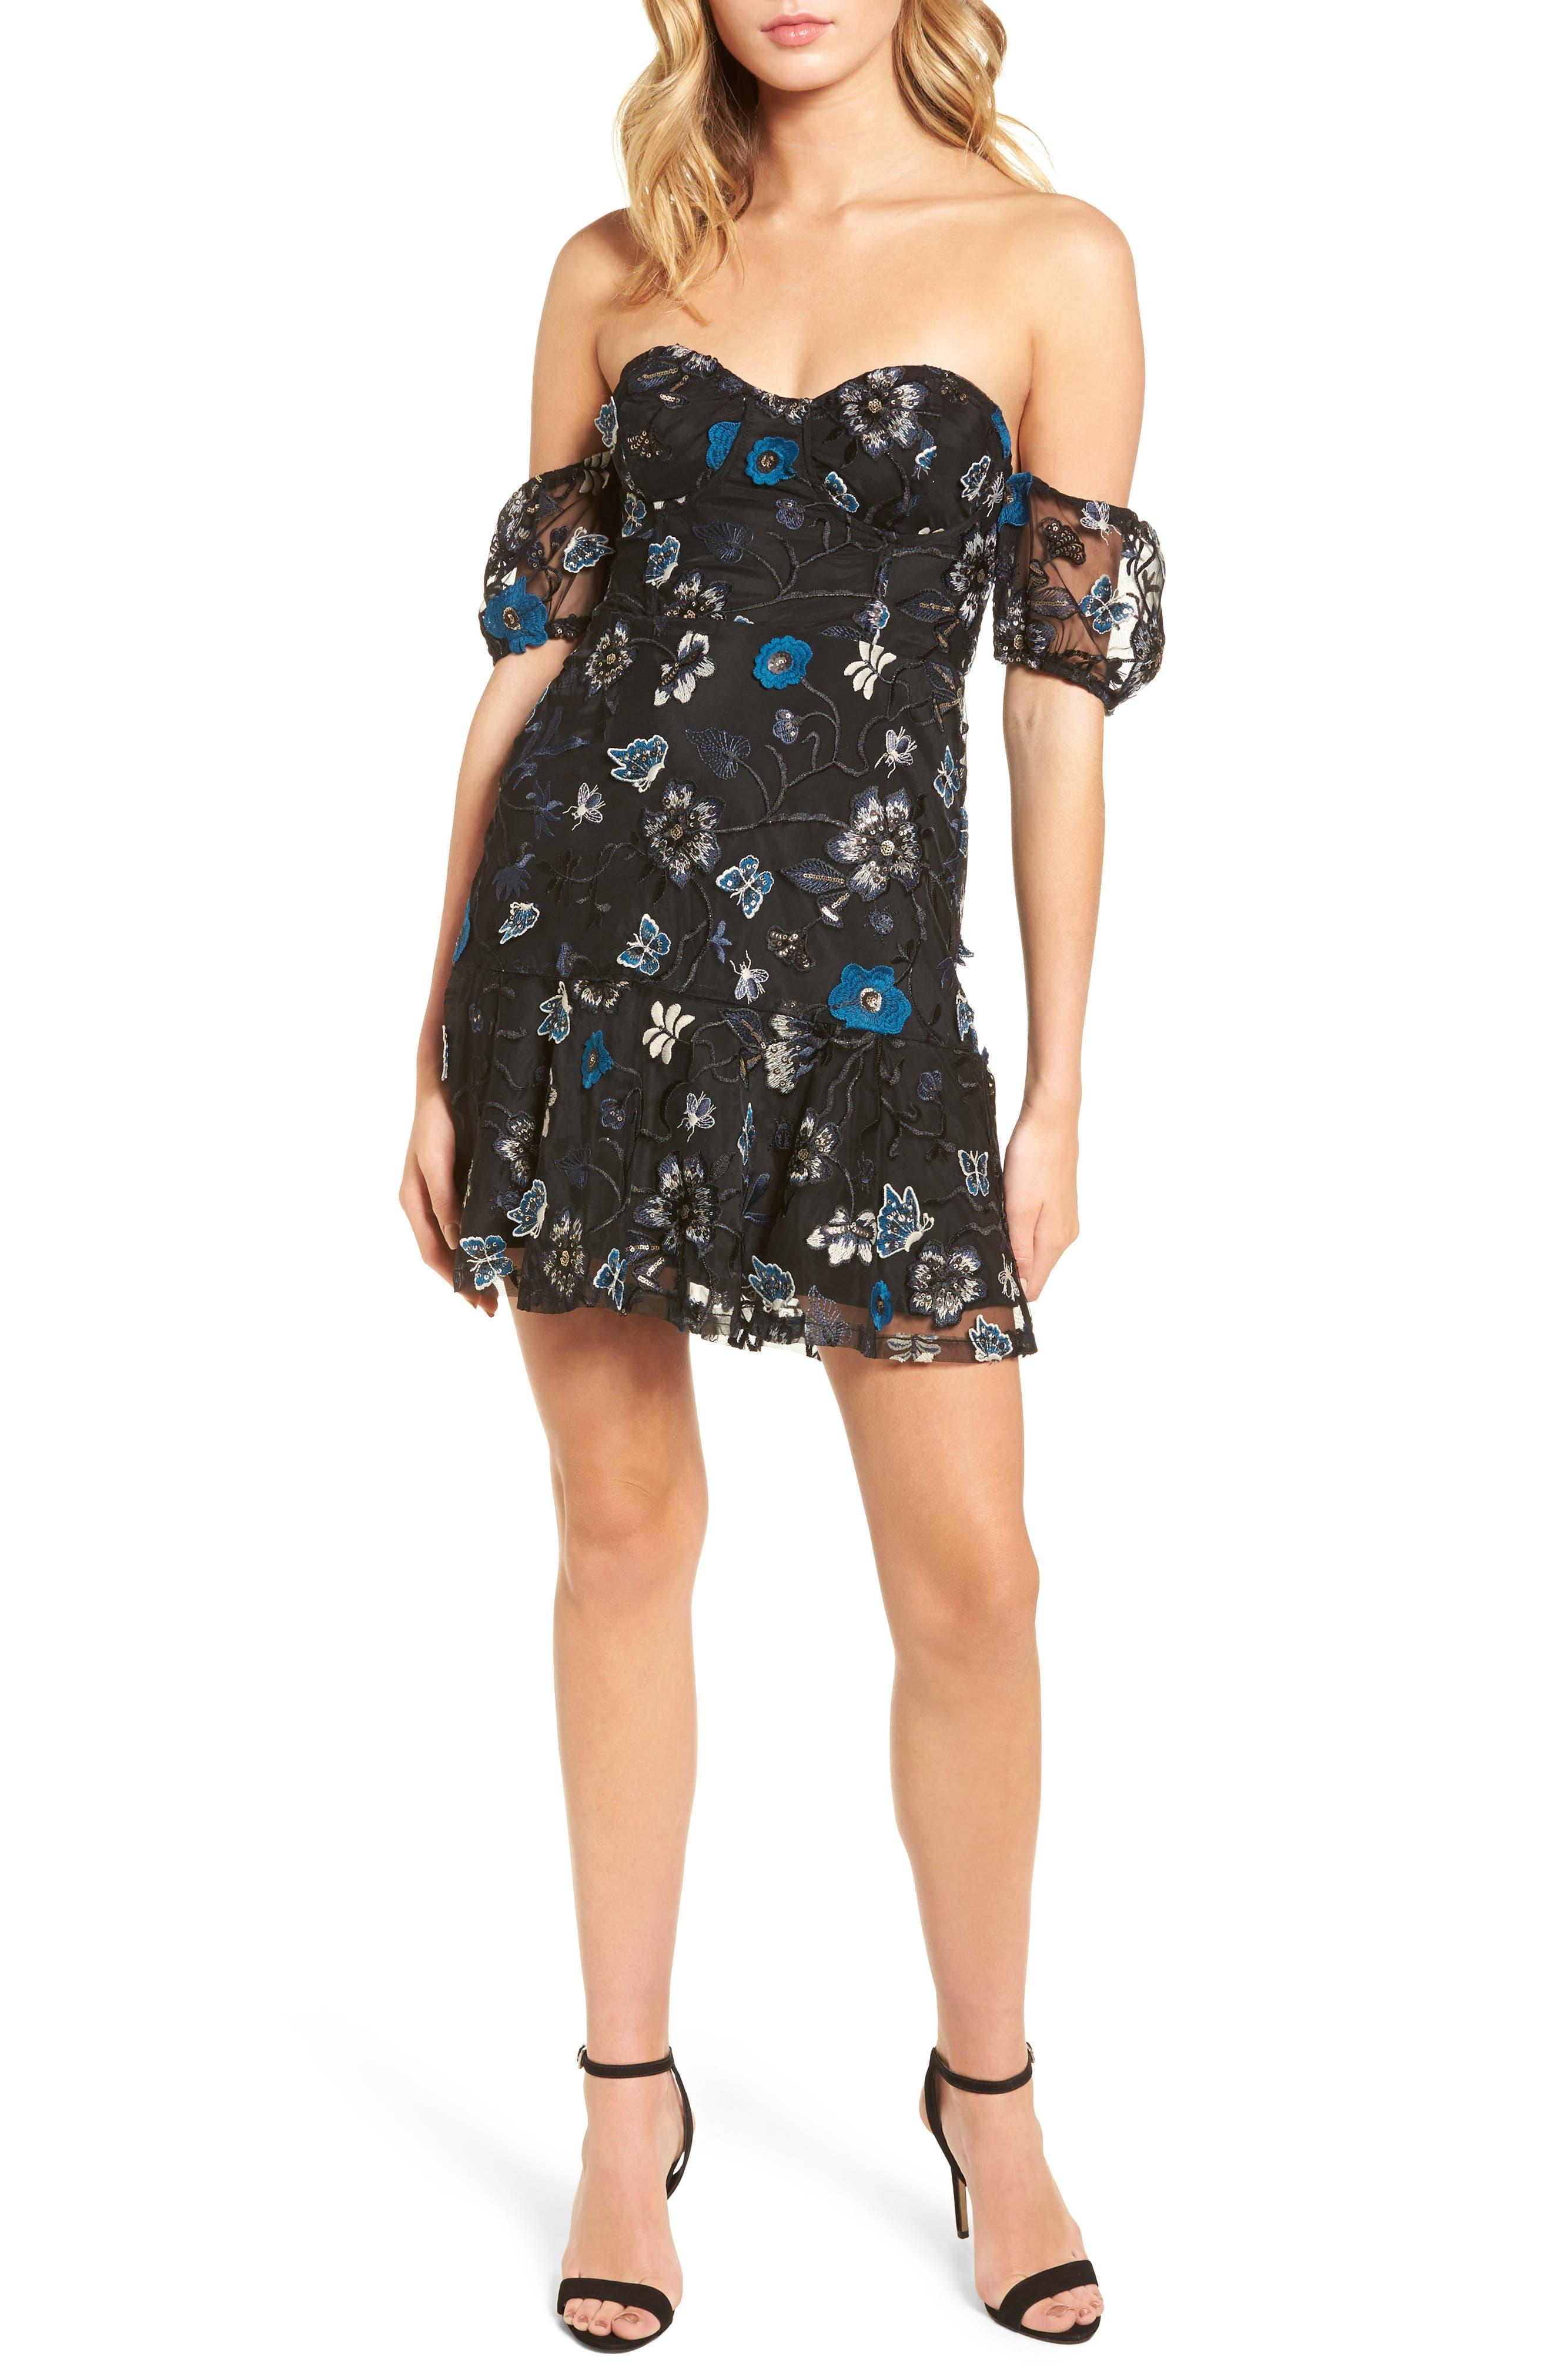 Main Image - For Love & Lemons Bontanic Off the Shoulder Dress